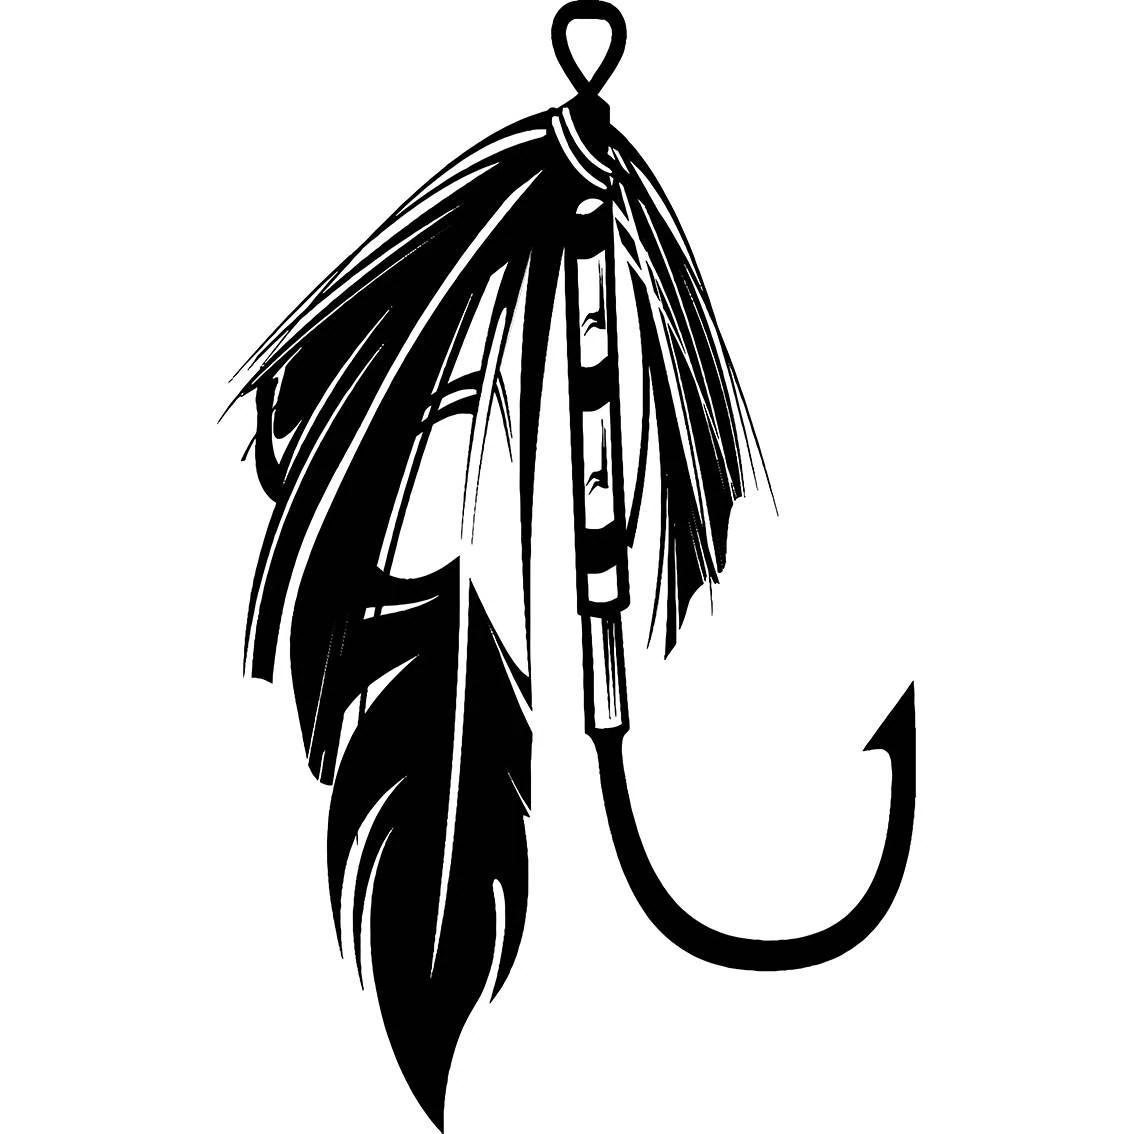 Fishing Lure 2 Hook Fisherman Logo 3 Prong Angling Fish